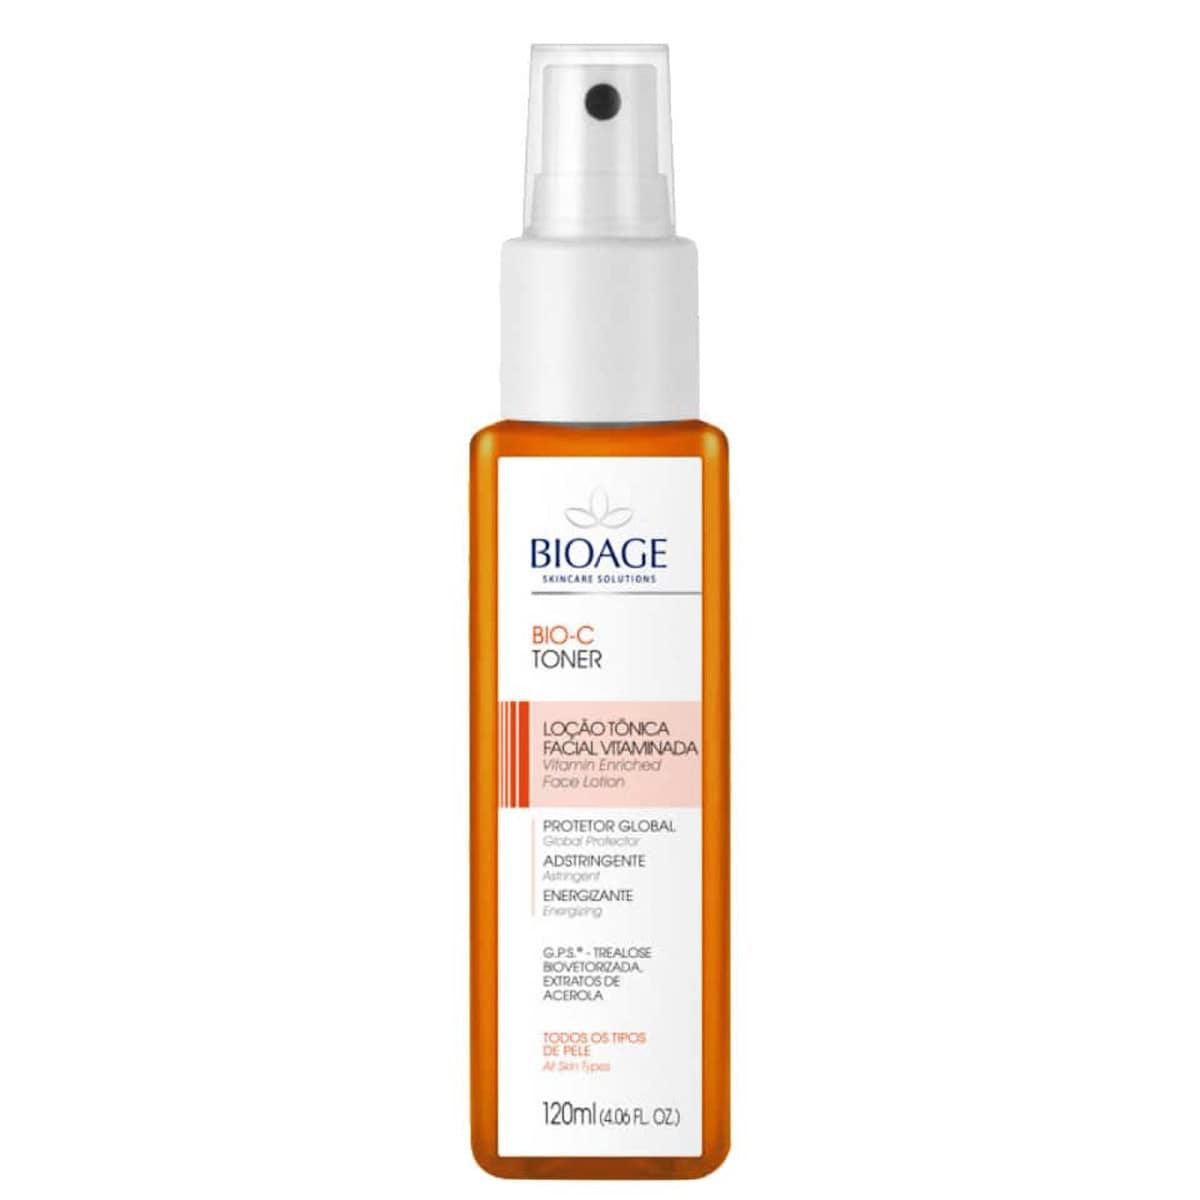 Bio C toner acerola loção tônica - 120 ml - Bioage